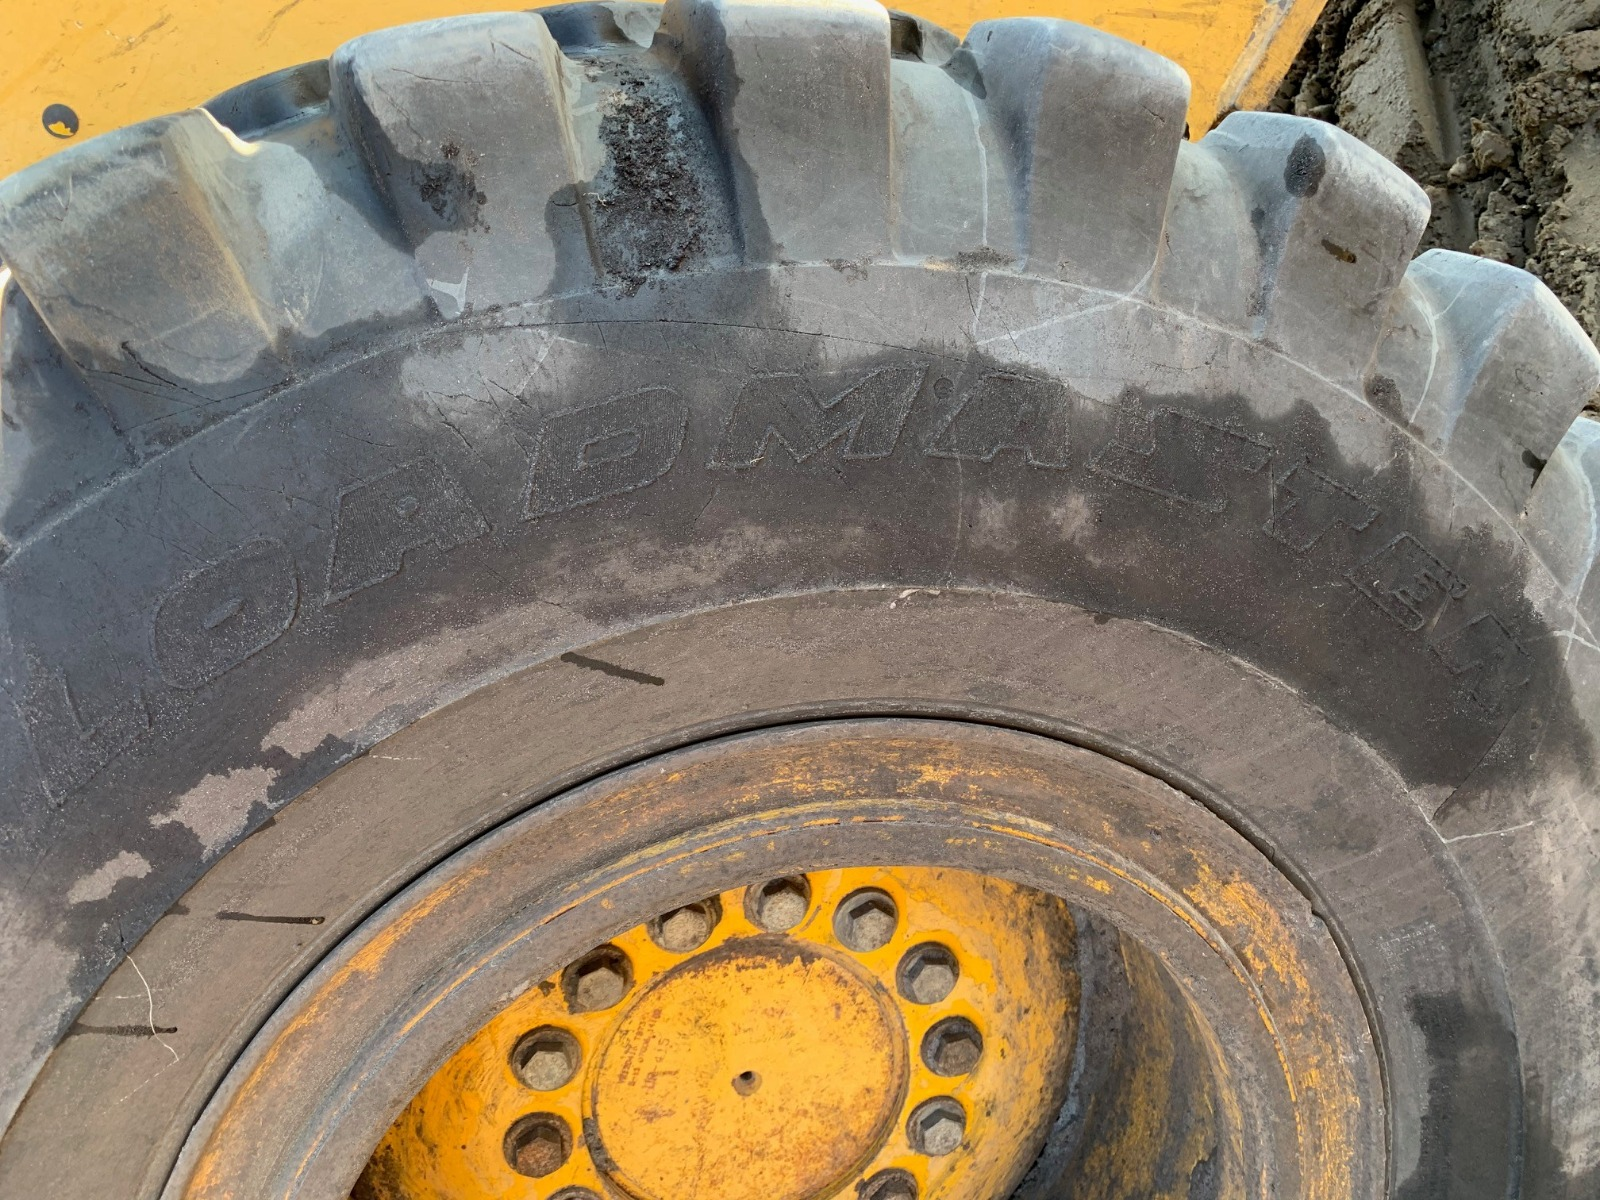 John Deere 544J dismantled machine photo 9